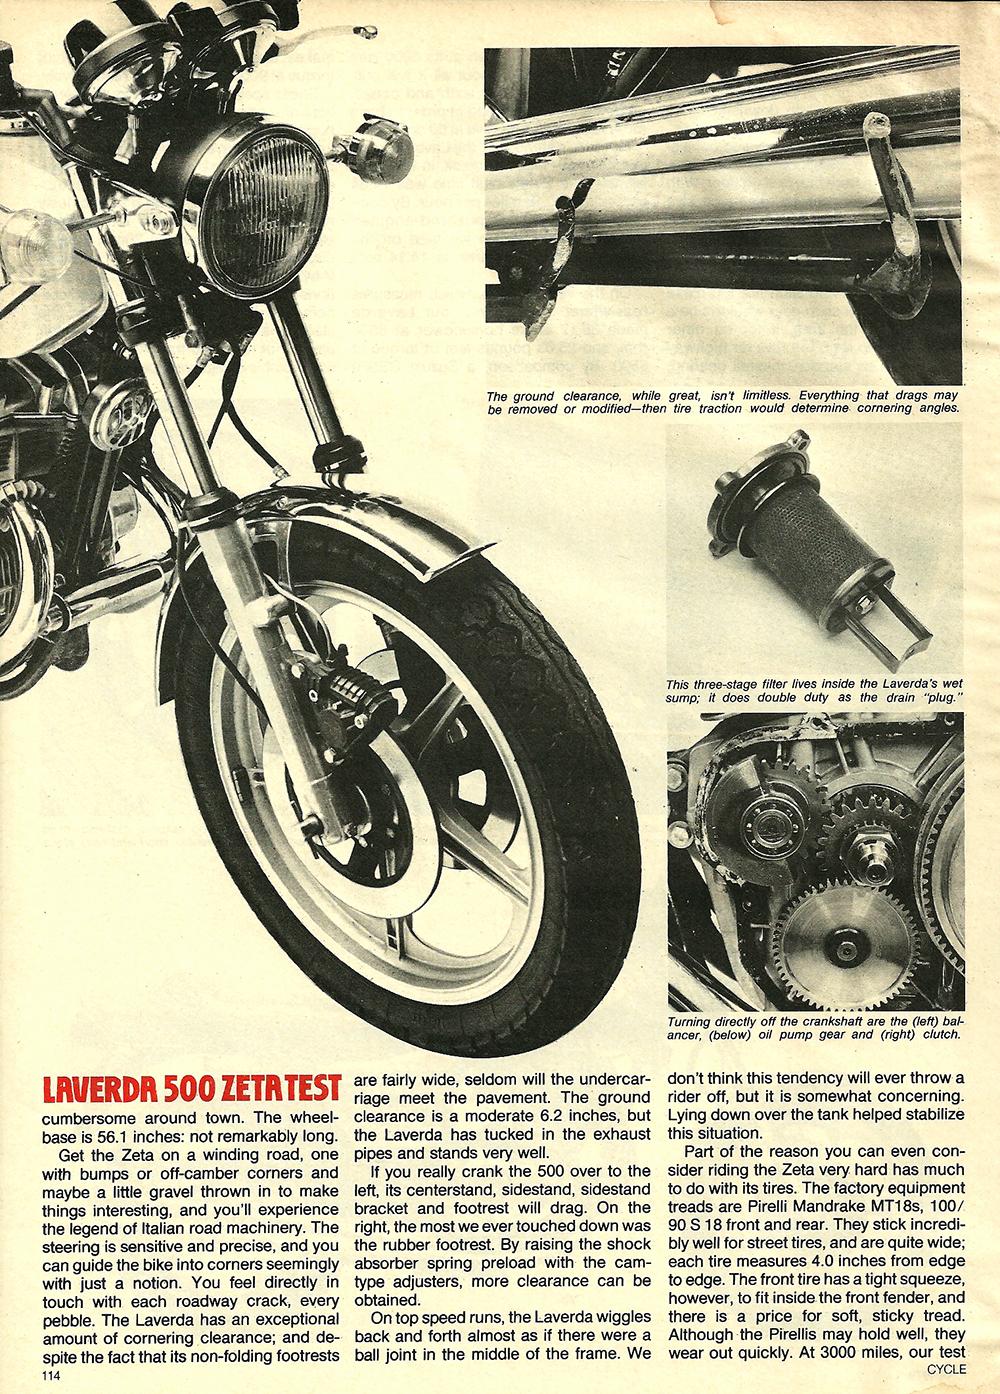 1979 Laverda 500 Zeta road test 5.jpg